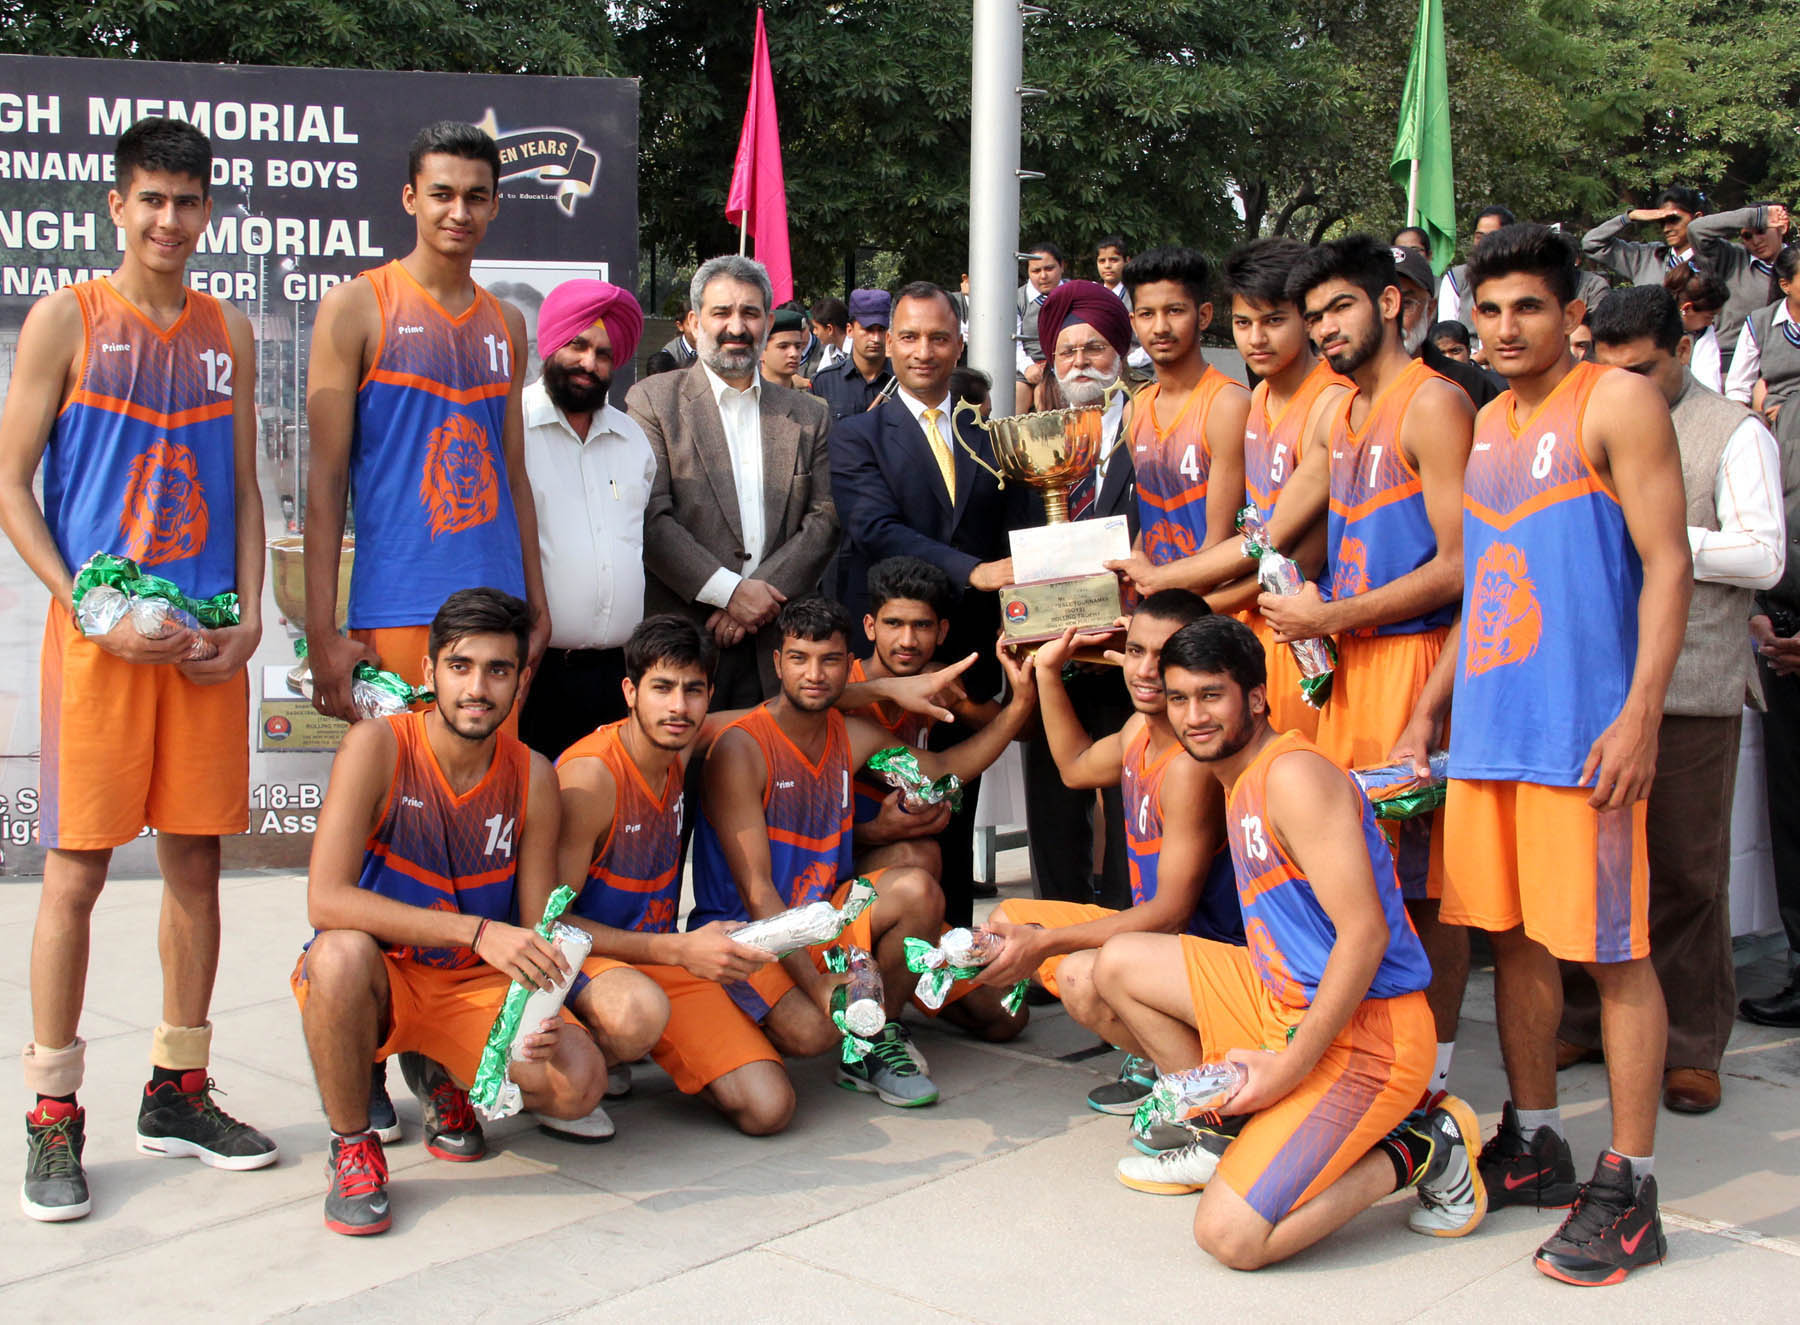 The Adviser to the Administrator, UT, Chandigarh, Mr. Vijay Dev giving away the Trophy to Winner team of Rao Jai Singh Memorial Basketball Tournament for Boys at New Public School, Sectror-18, Chandigarh on Monday, November 30, 2015.